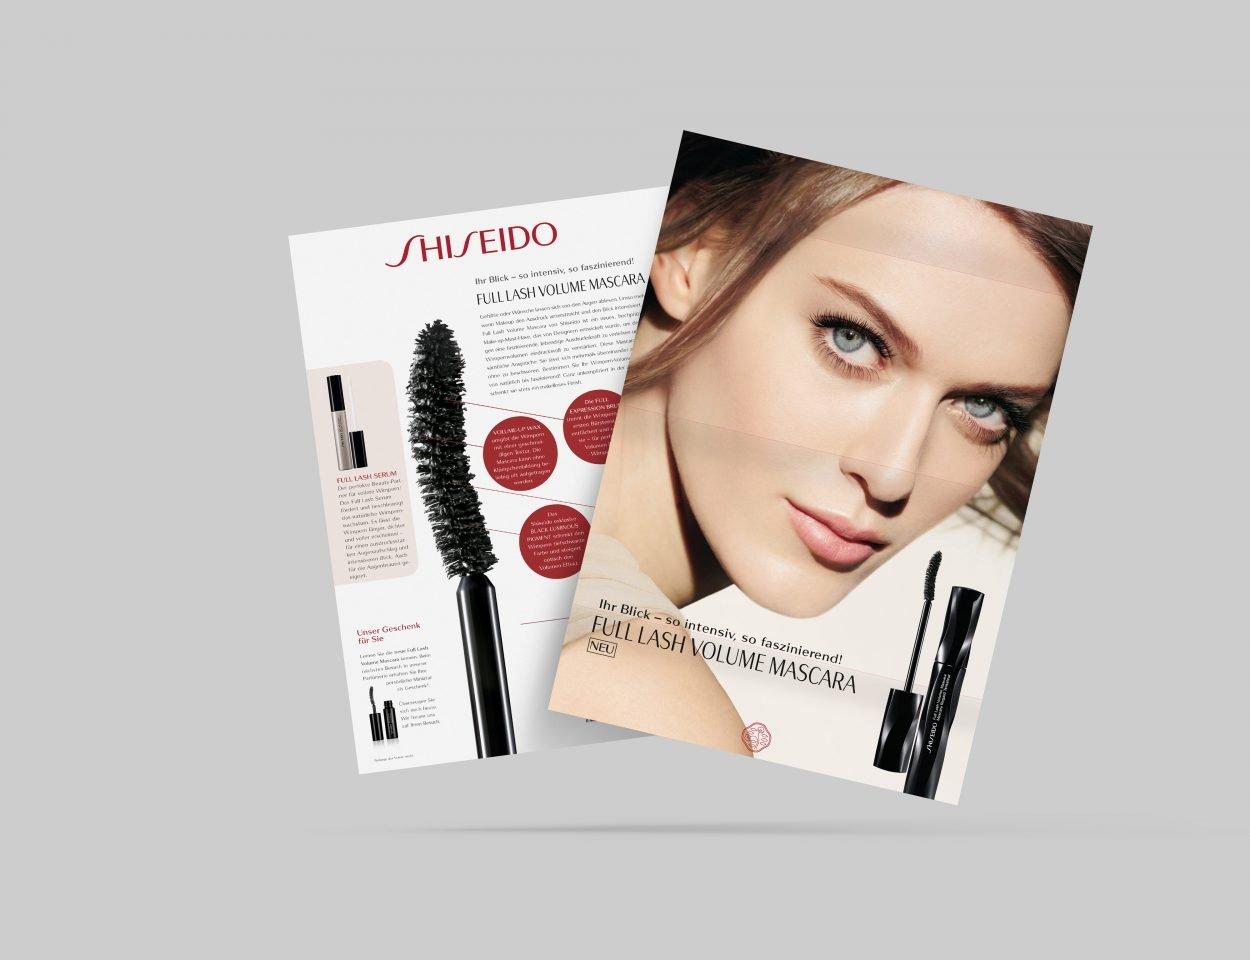 Shiseido-Mailing